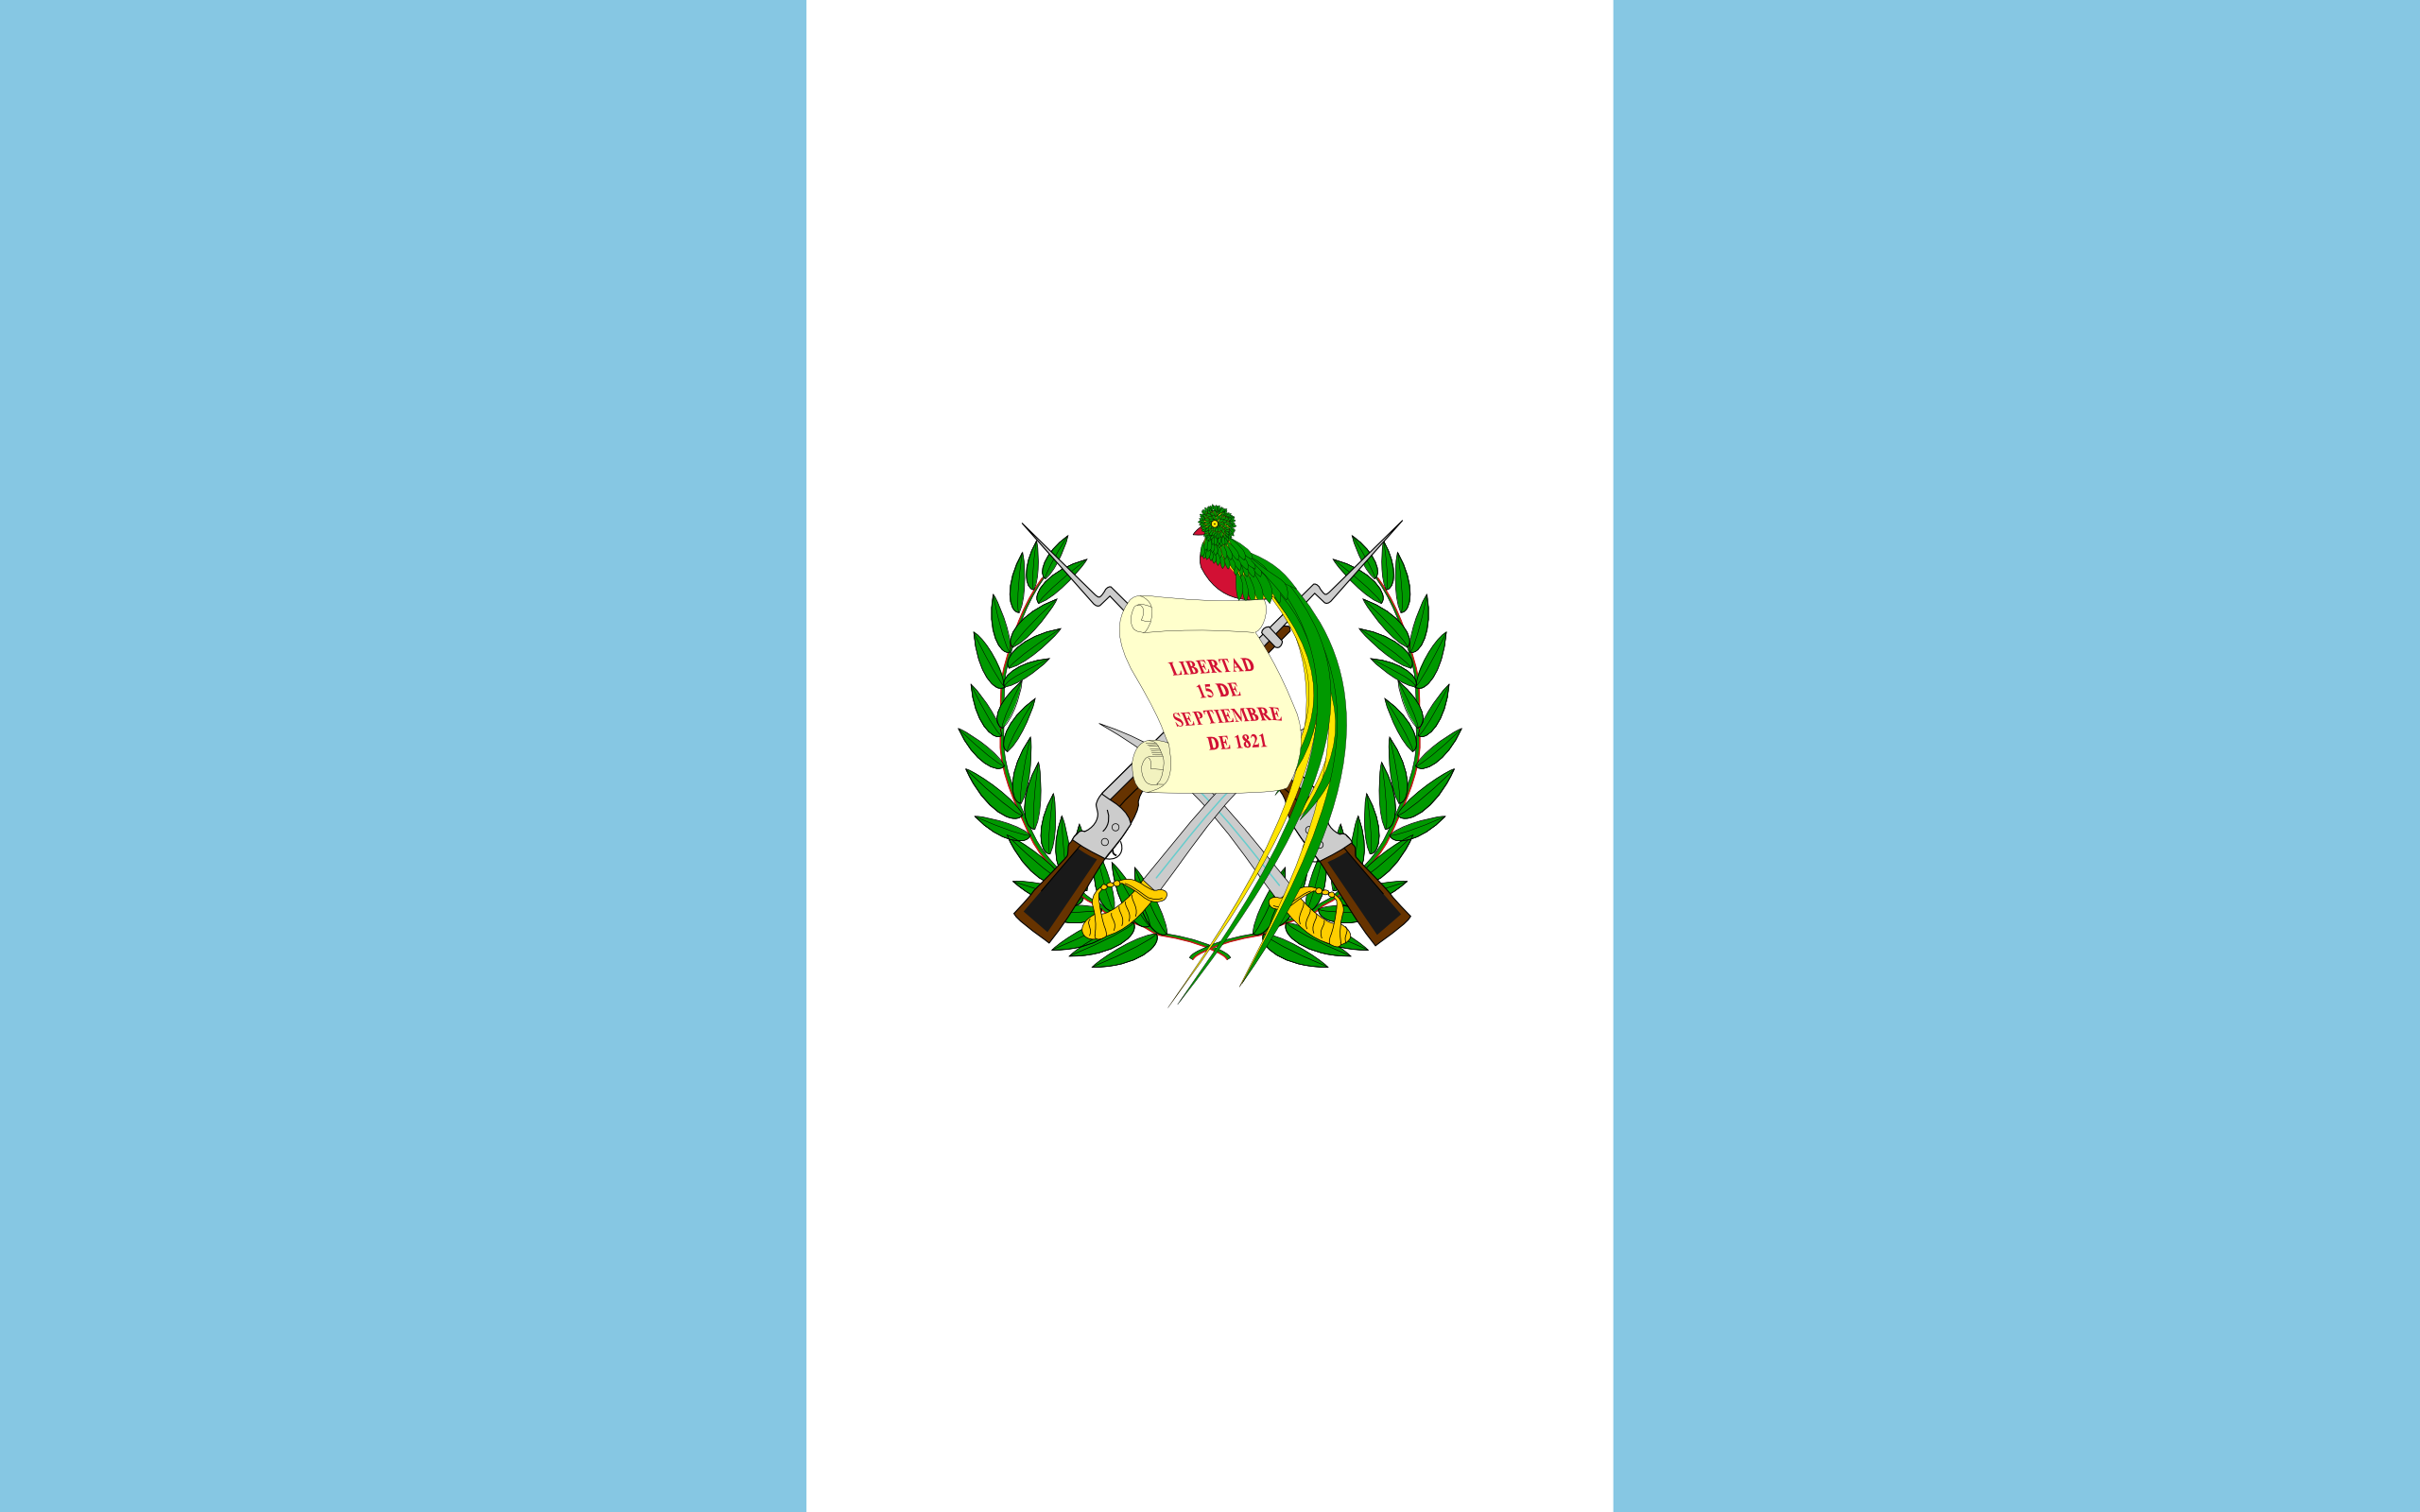 guatemala, 国家, 会徽, 徽标, 符号 - 高清壁纸 - 教授-falken.com